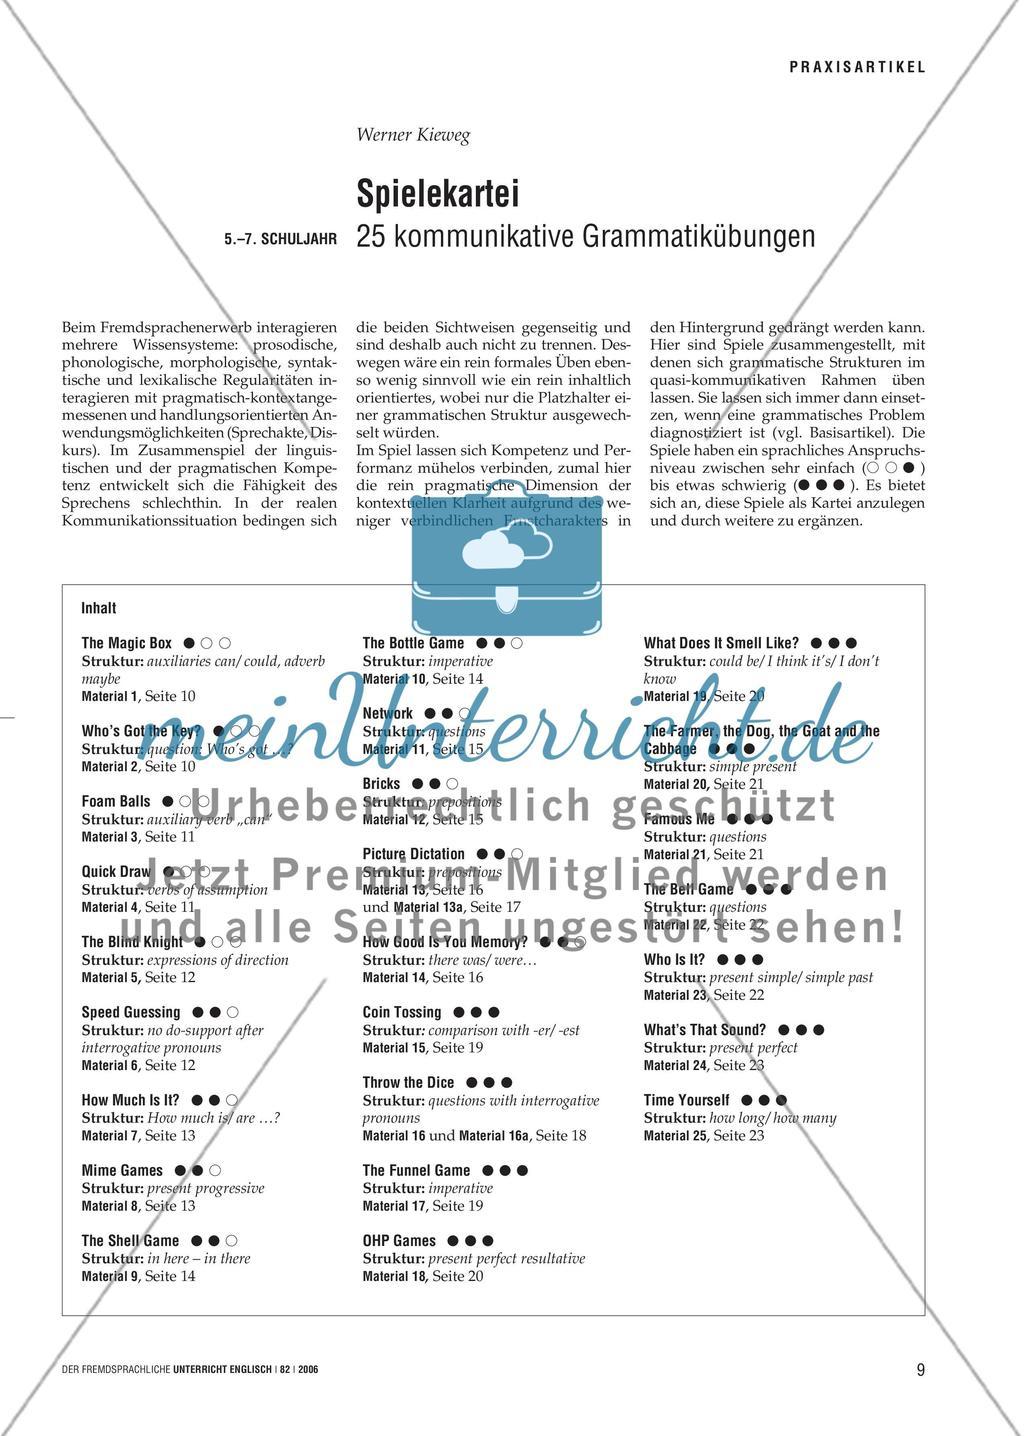 Spielekartei - 25 kommunikative Grammatikübungen Preview 1